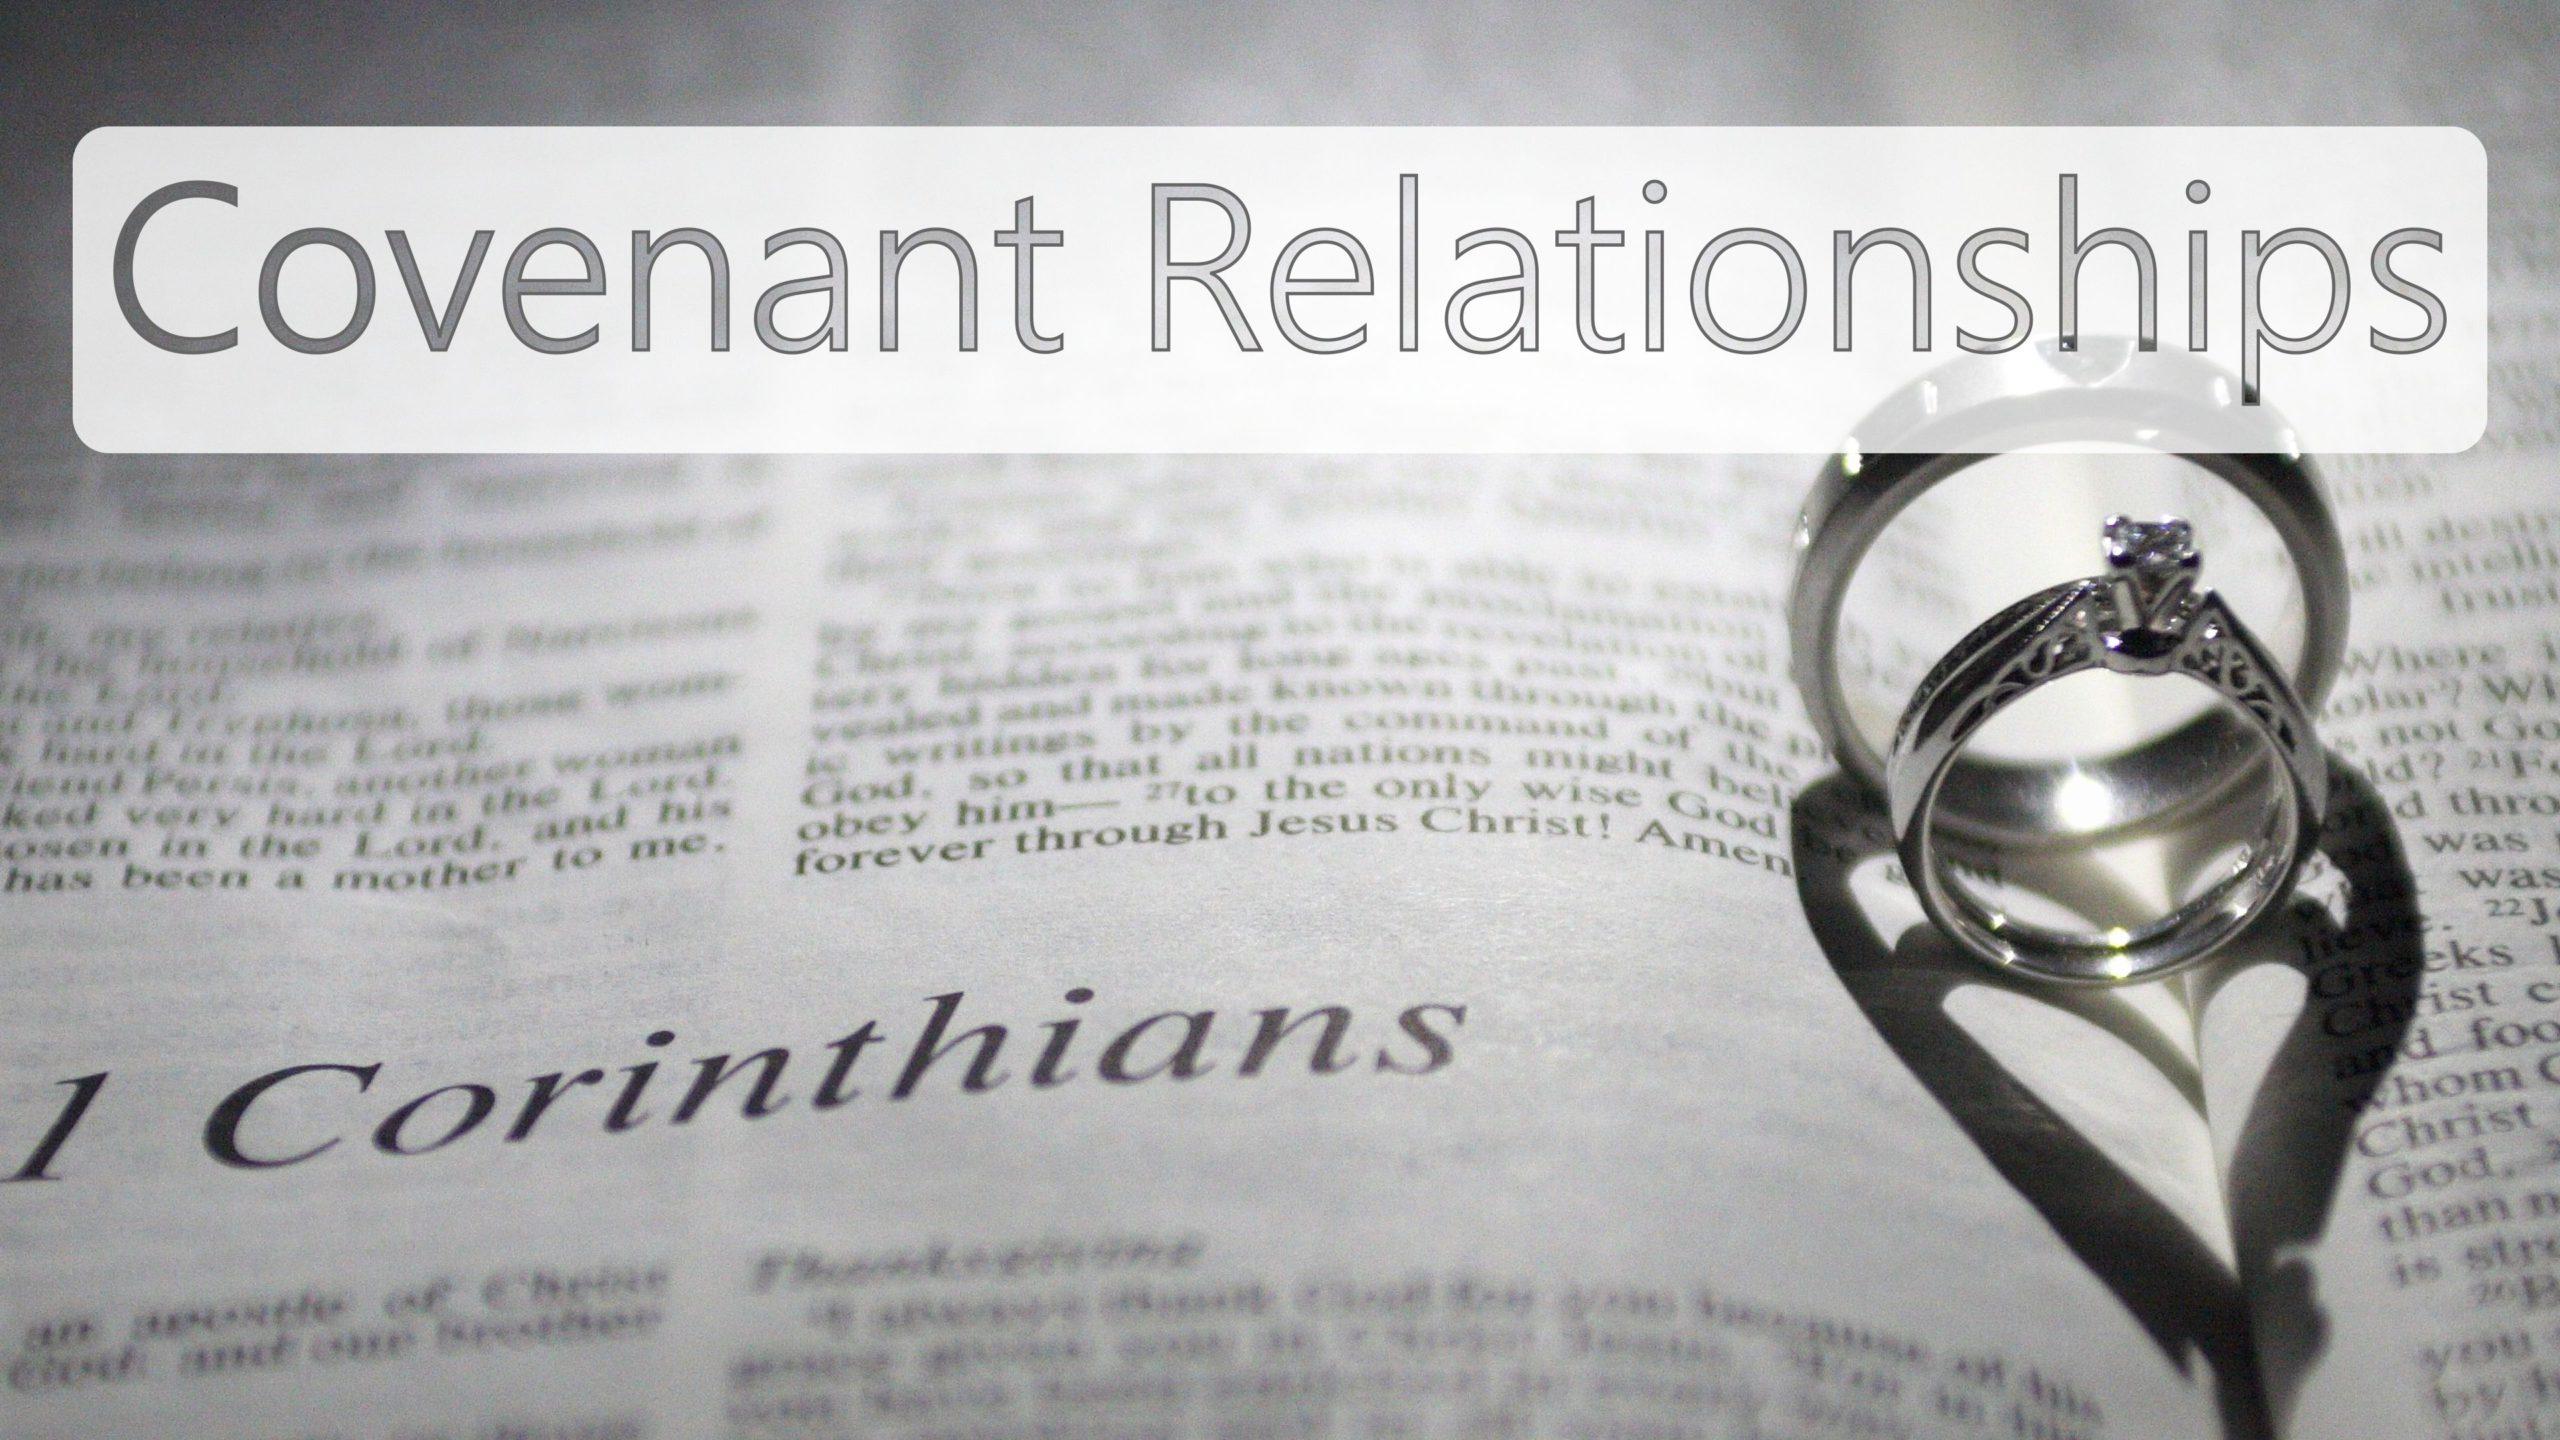 Covenant Relationships